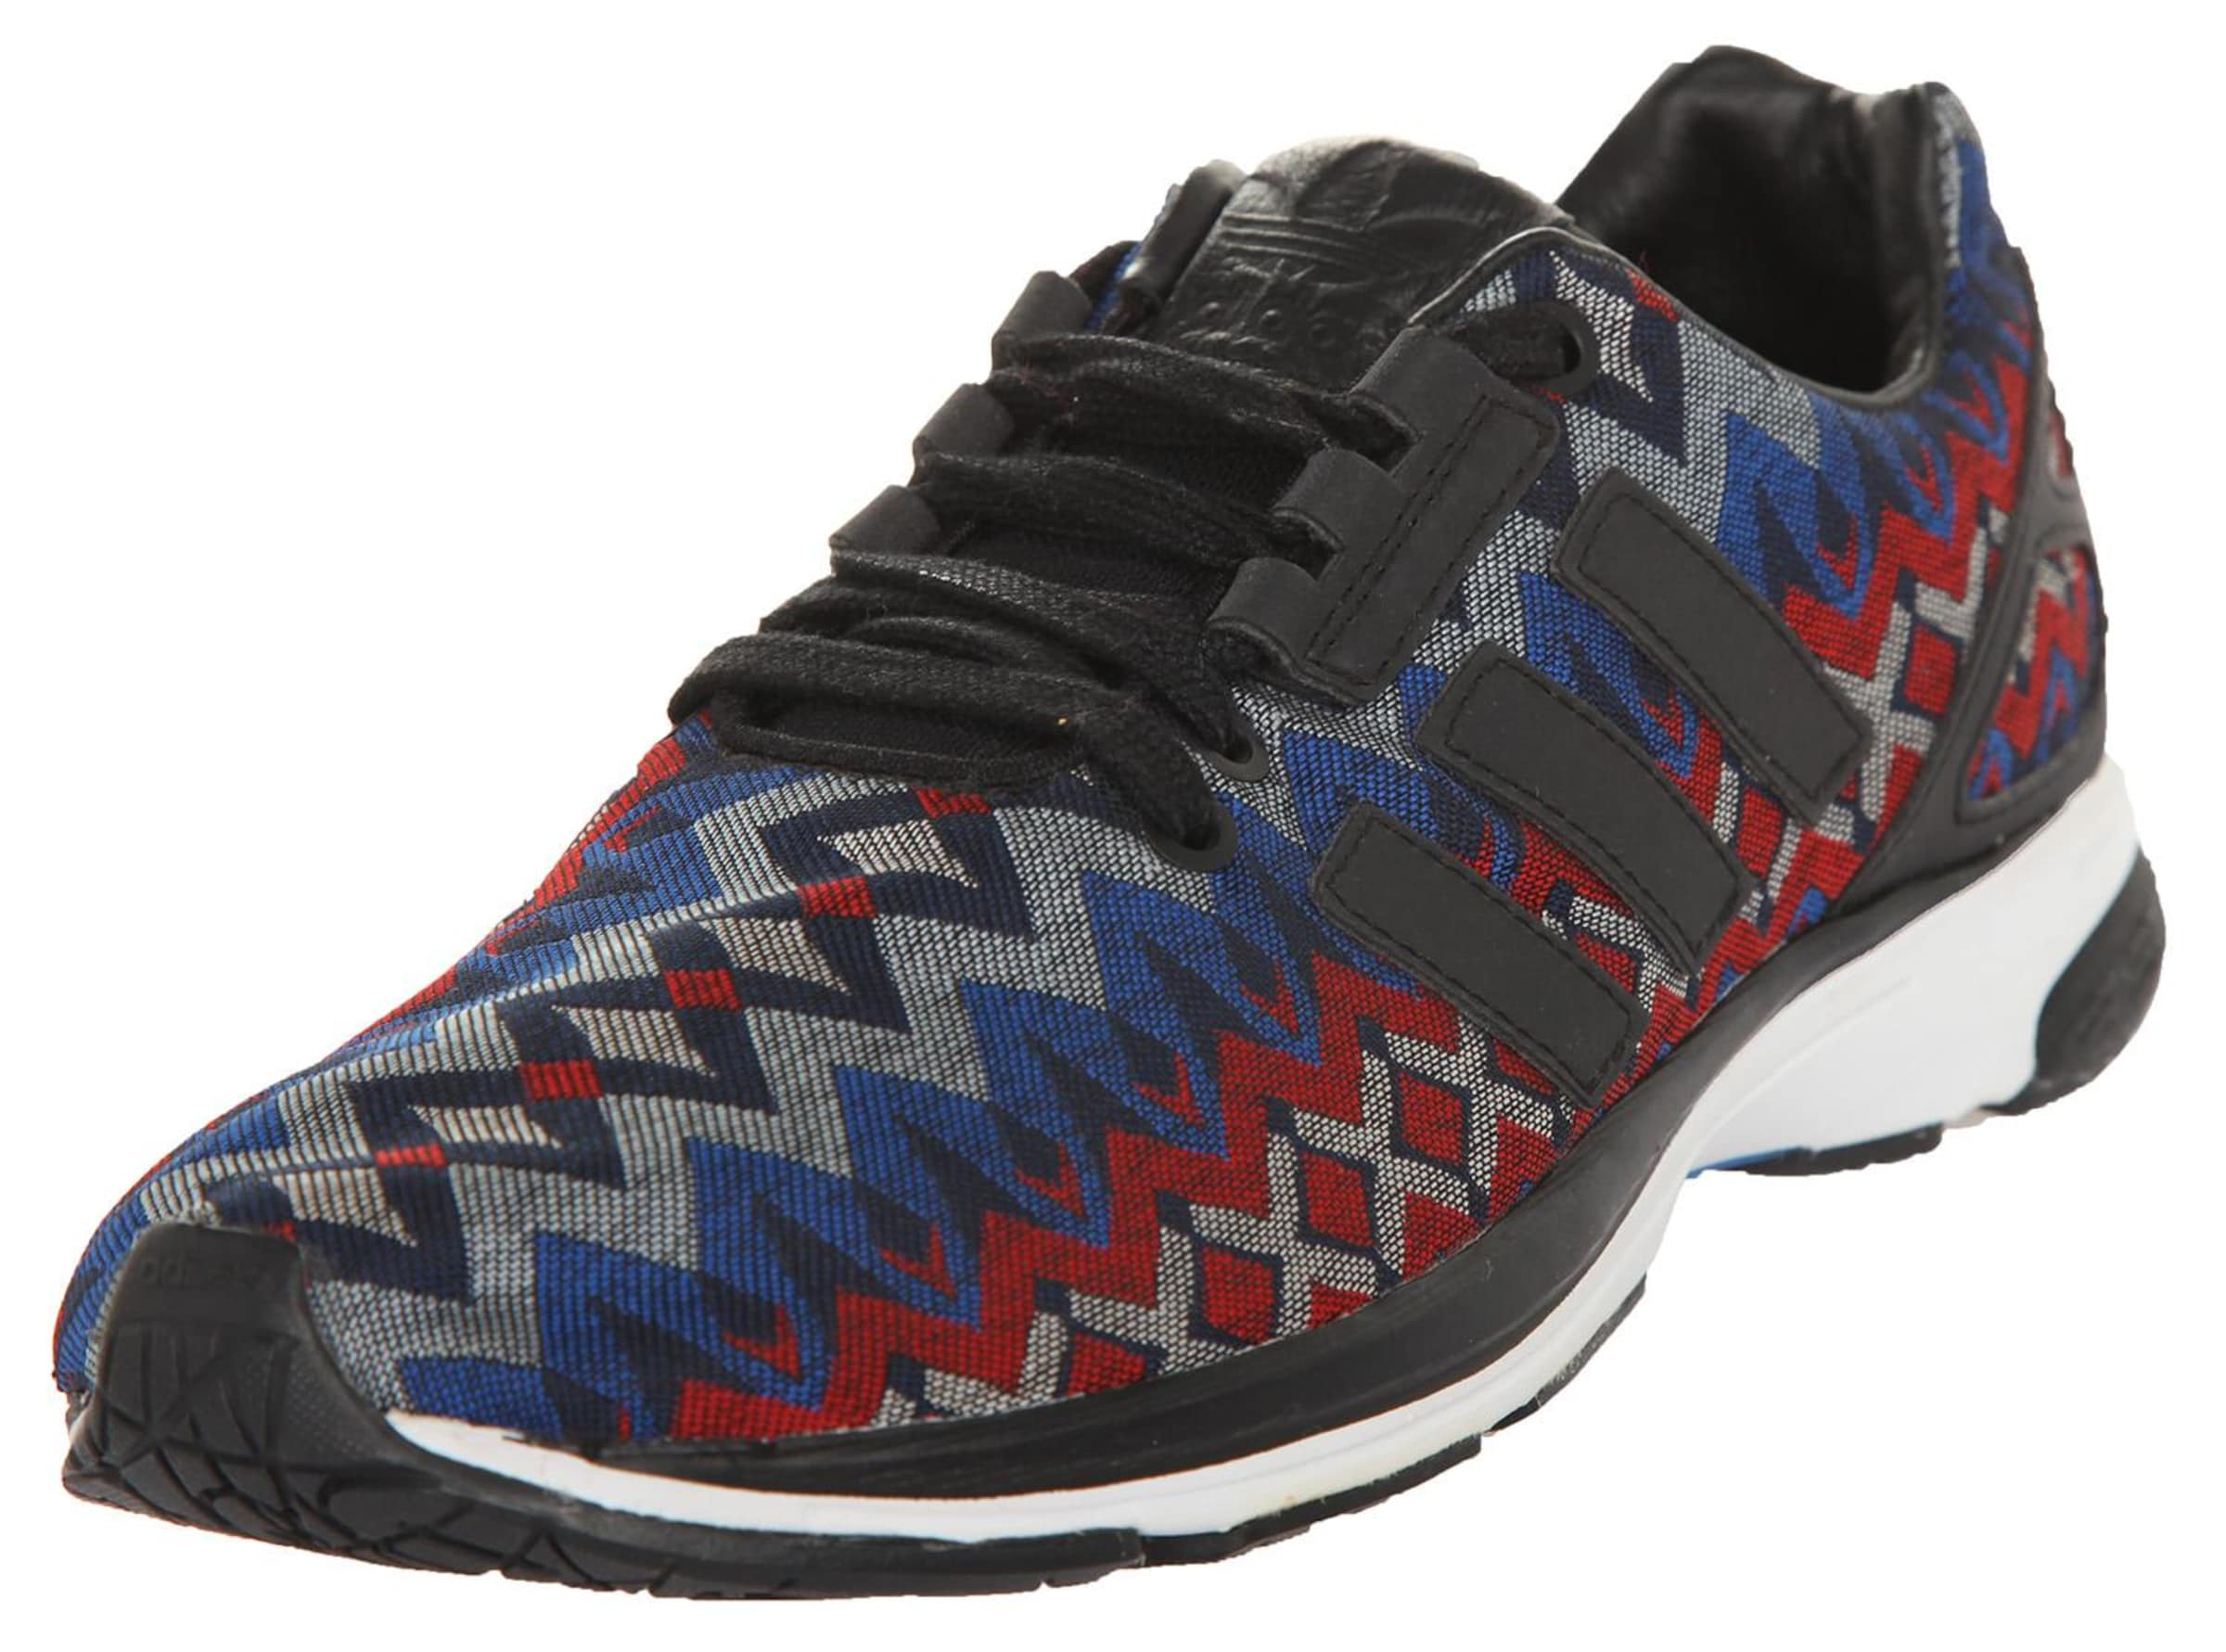 MischfarbenSchwarz Tech Sneaker 'zx Flux M21304' Adidas In Originals kZiwuTOPX